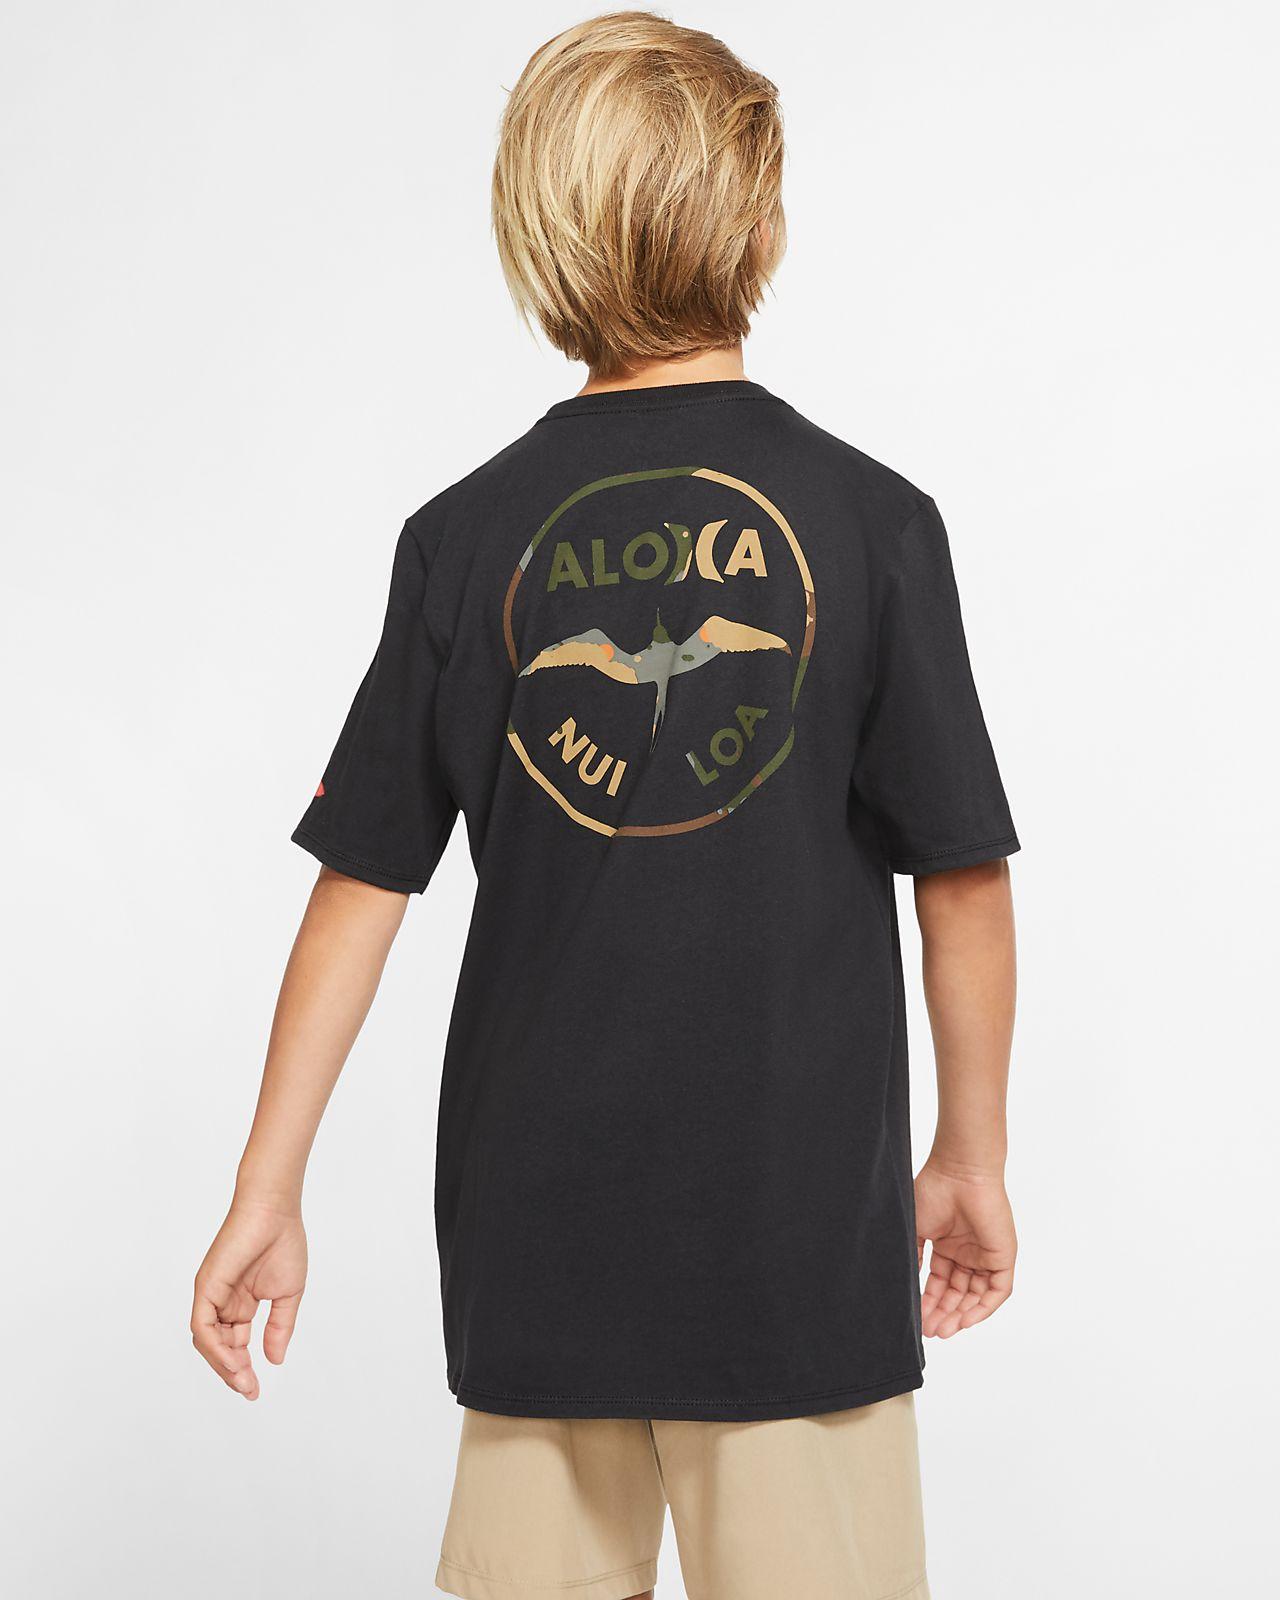 Hurley Premium JJF Aloha Boys' Premium Fit T-Shirt